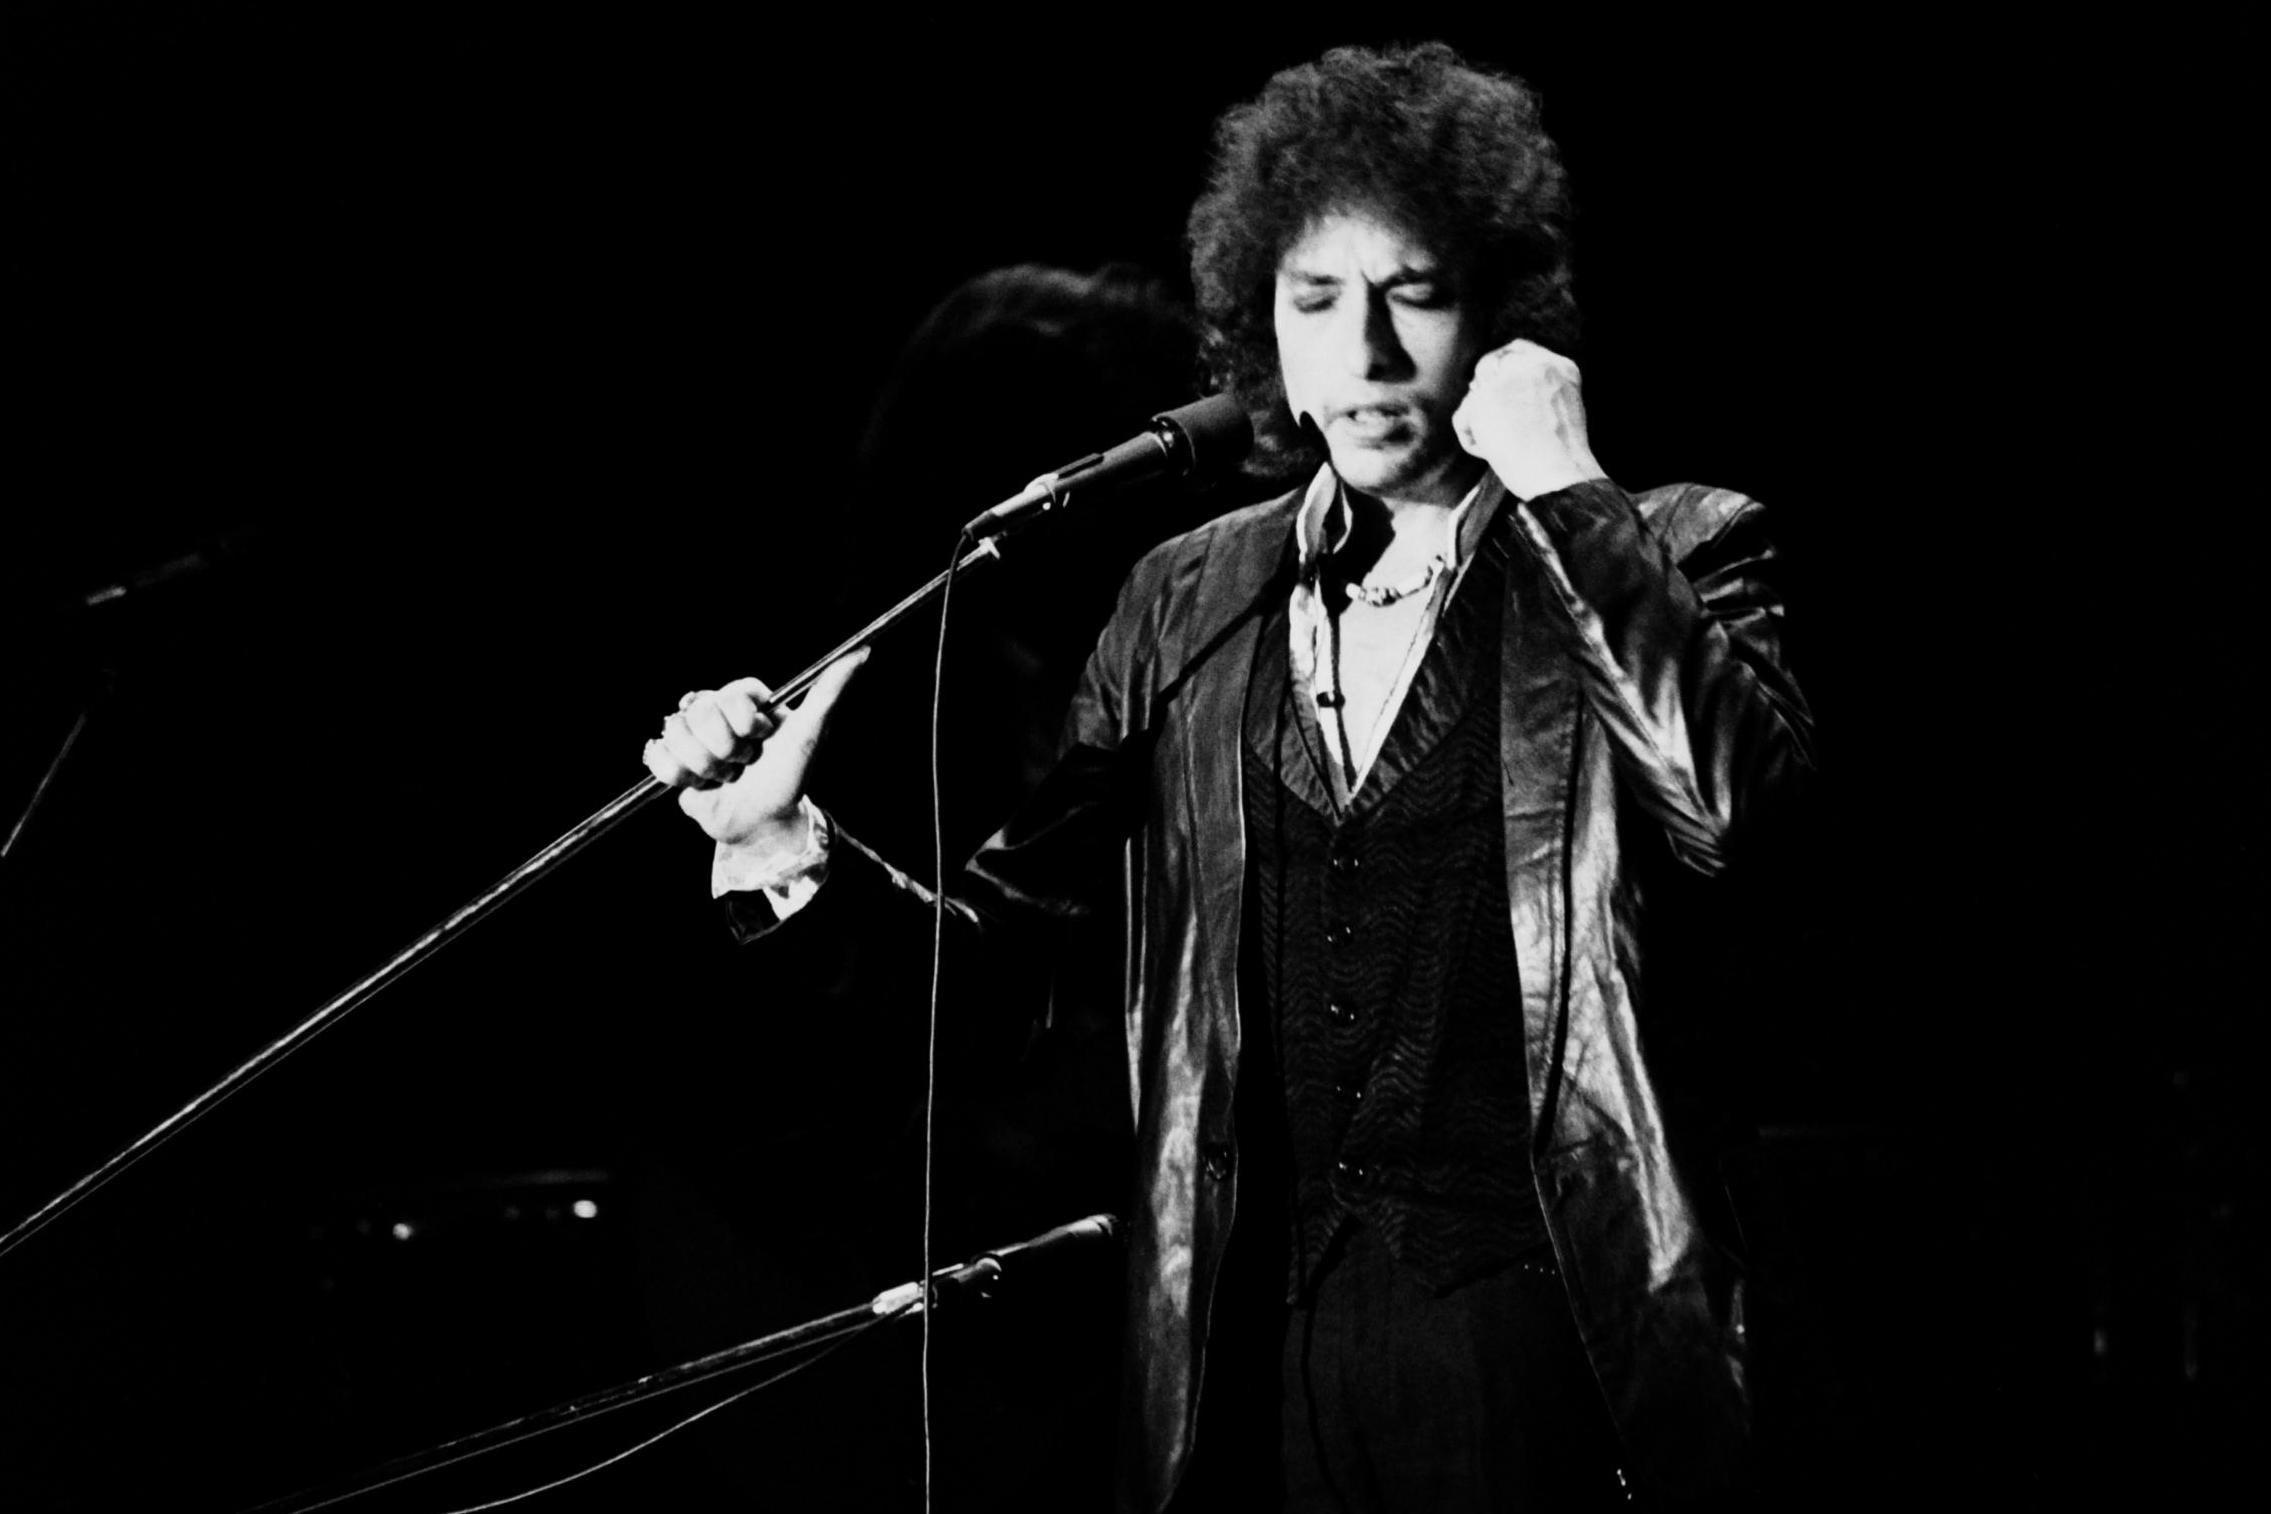 Martin Scorsese's new Bob Dylan documentary gets Netflix